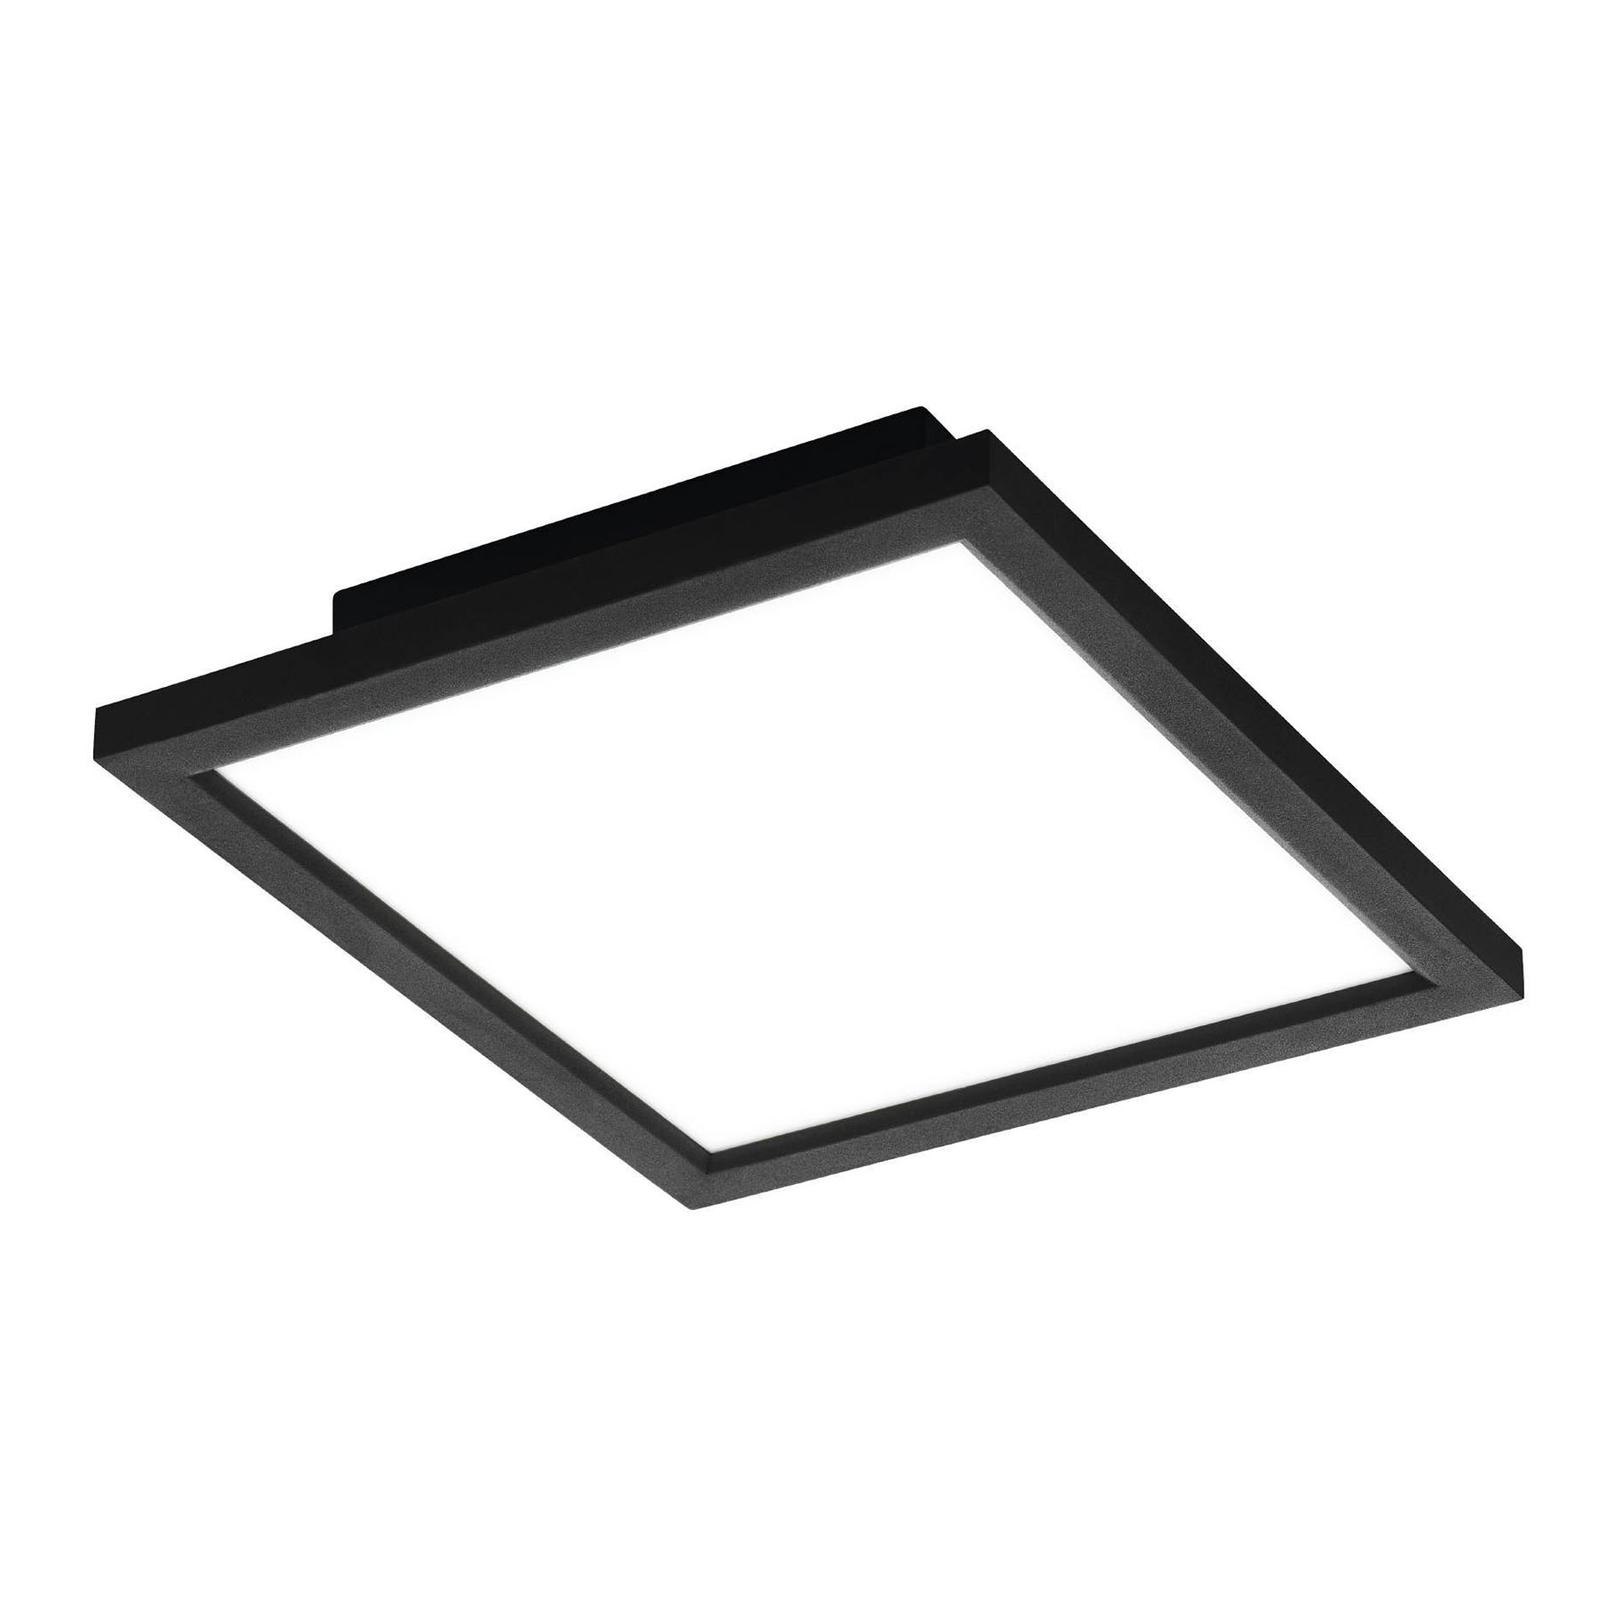 EGLO connect Salobrena-C LED-Panel schwarz 30x30cm